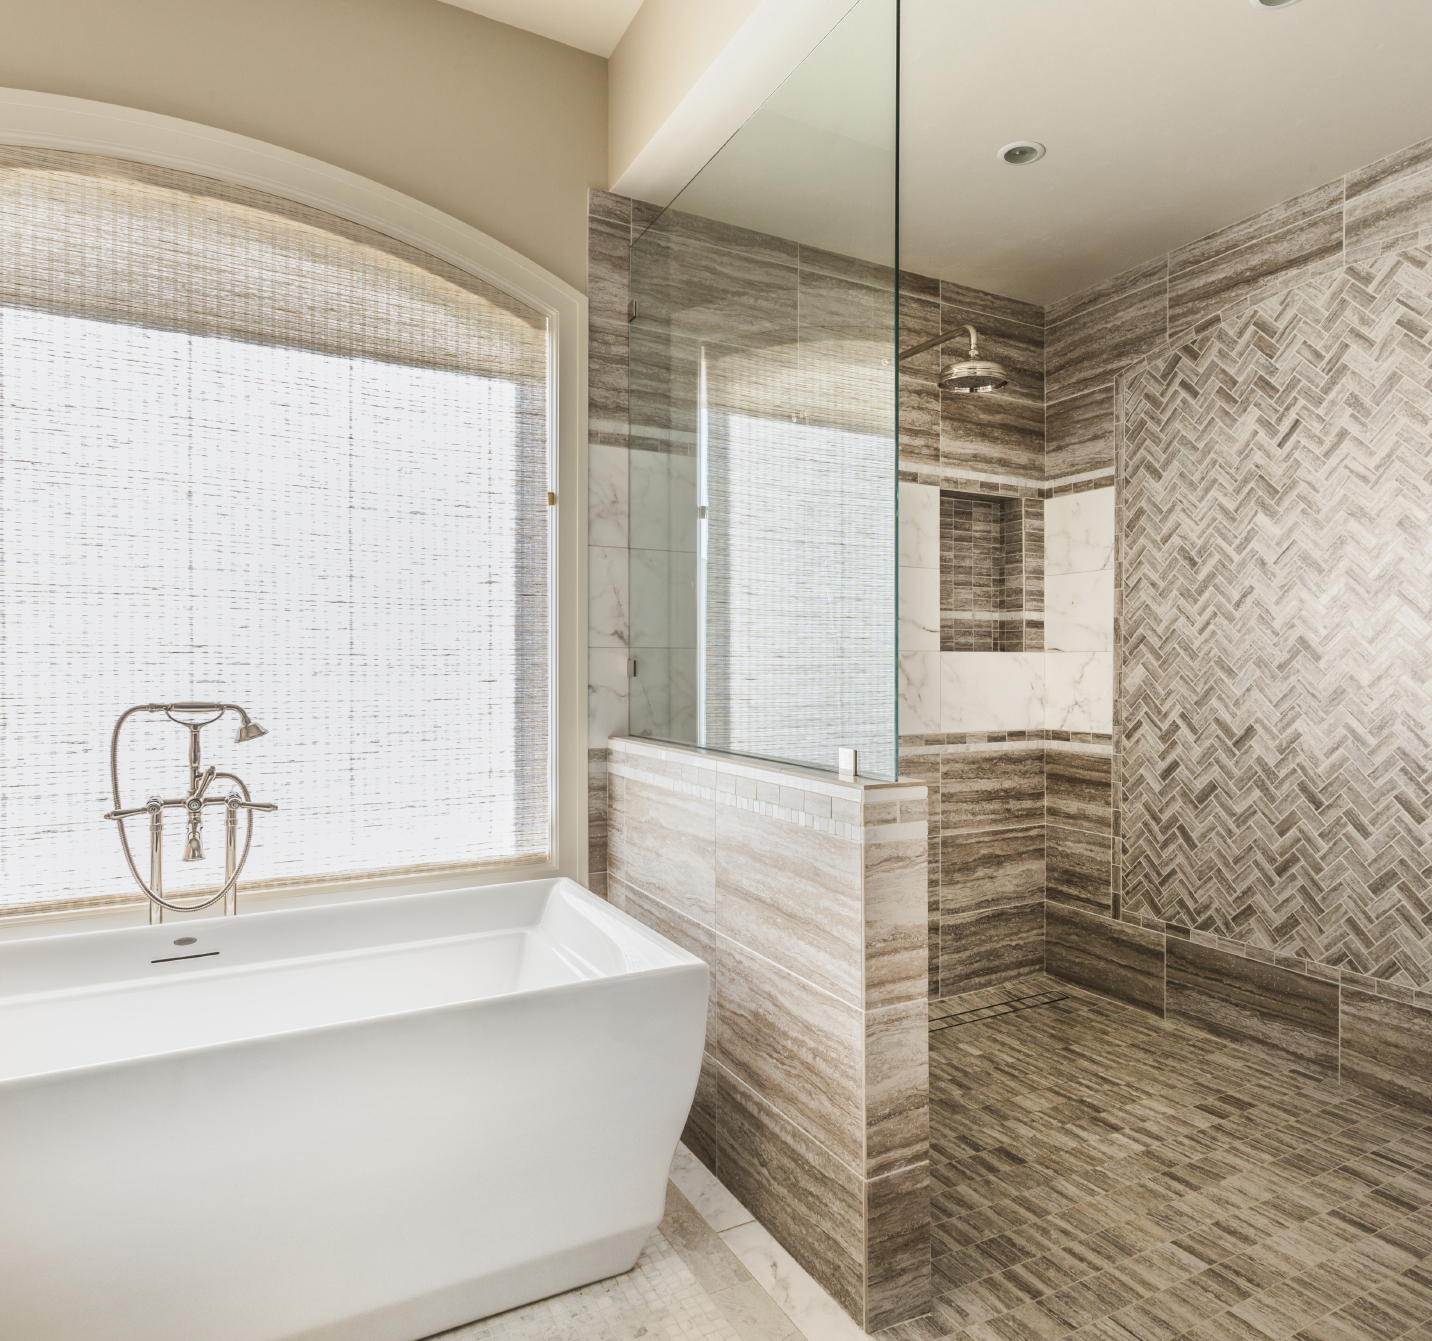 Tarnat custom homes bathroom renovation contractor for Custom bathroom renovations